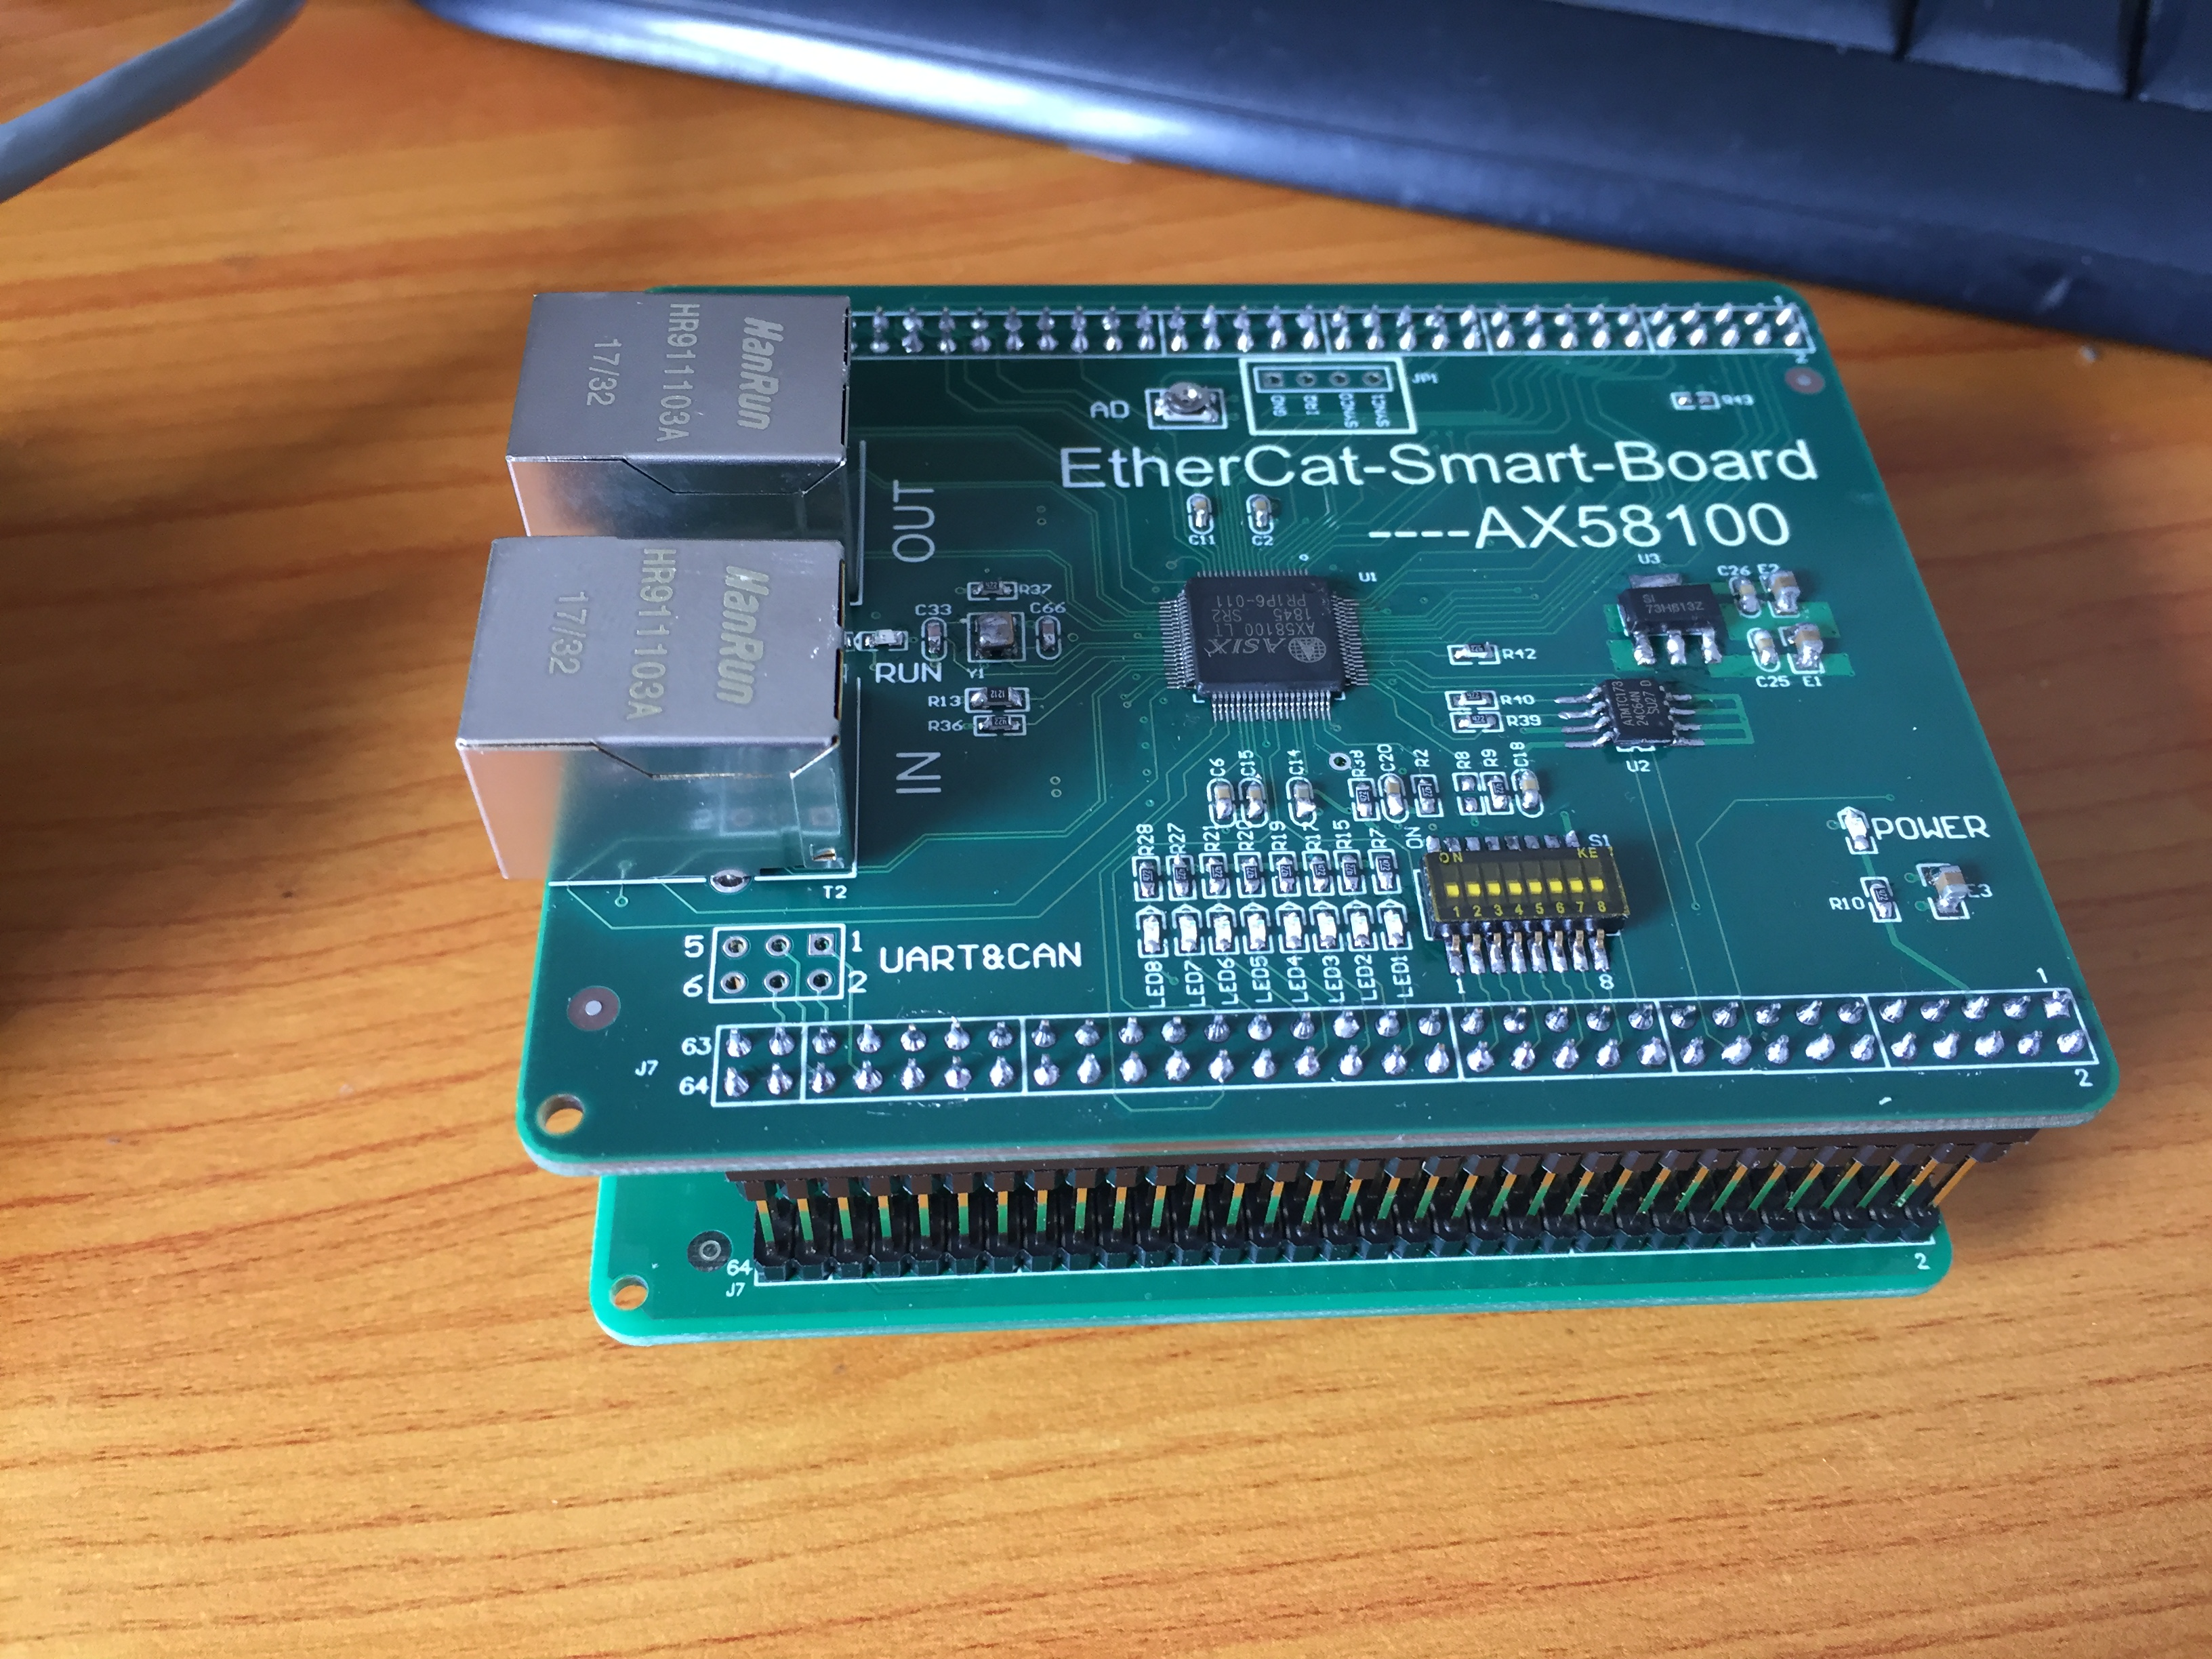 Genuine EtherCat-AX58100 Development Board, Can Replace ET1100. STM32, DSP, ZYNQ Scheme